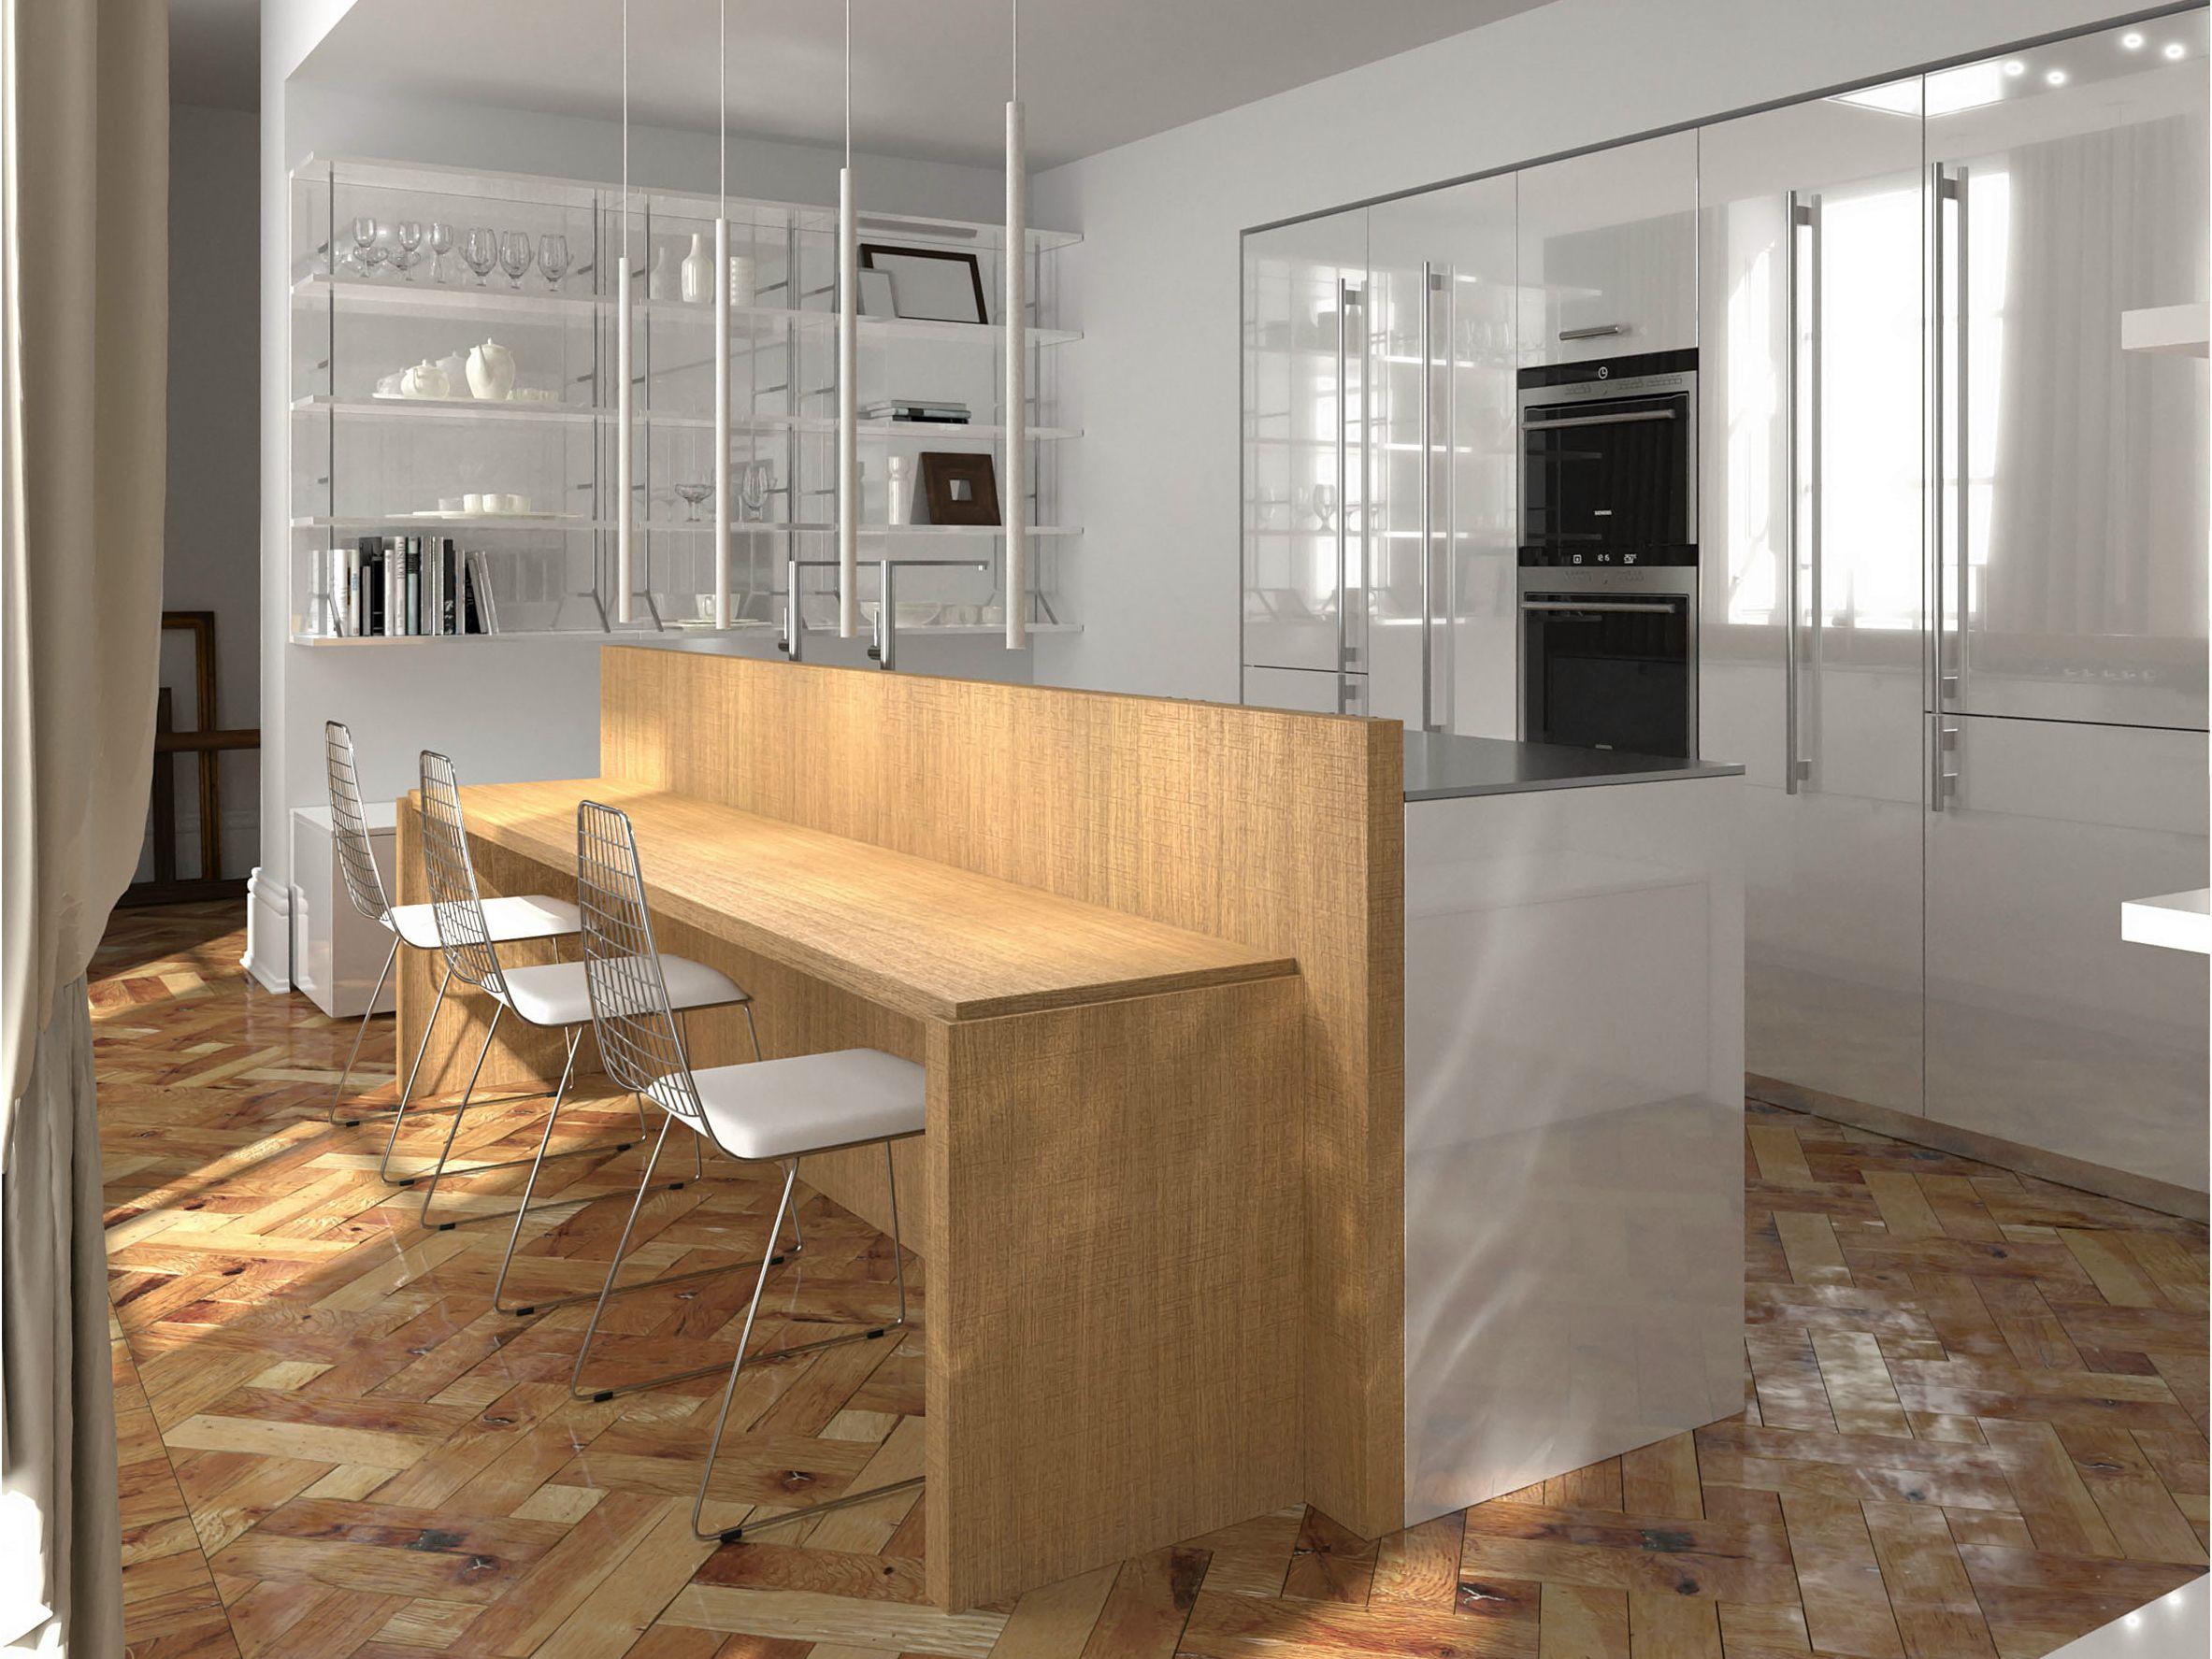 Cucina laccata in rovere noblesse cucina in rovere seghettato by aster cucine design lorenzo - Cucine in rovere ...